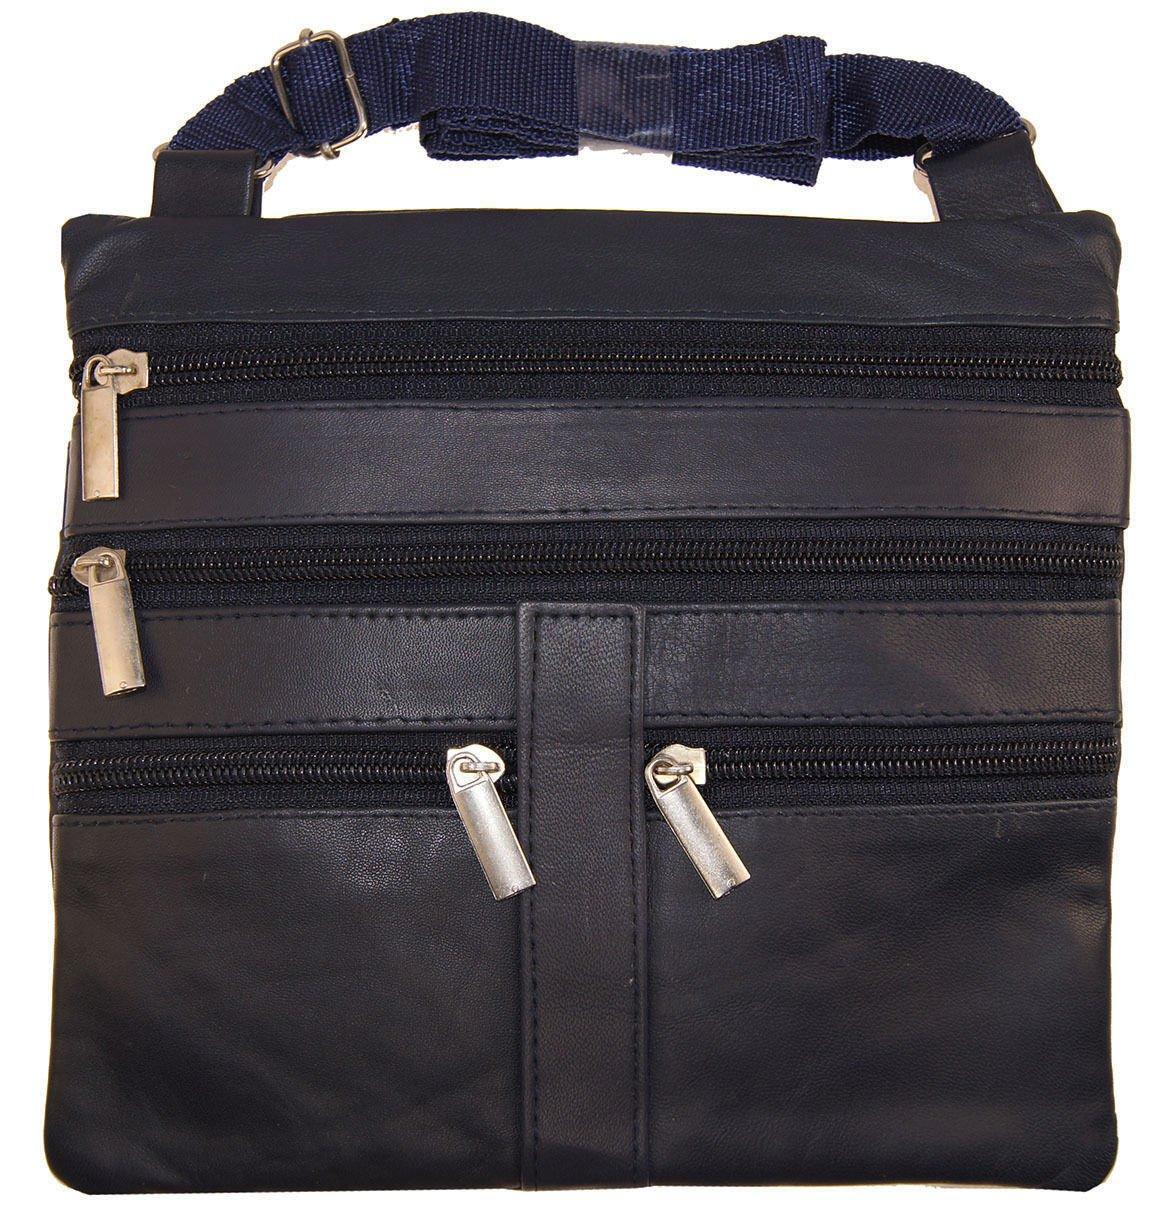 Navy Blue Ladies Genuine Leather Cross Body Bag Satchel Messenger Bag 48'' Strap by Wallet (Image #2)